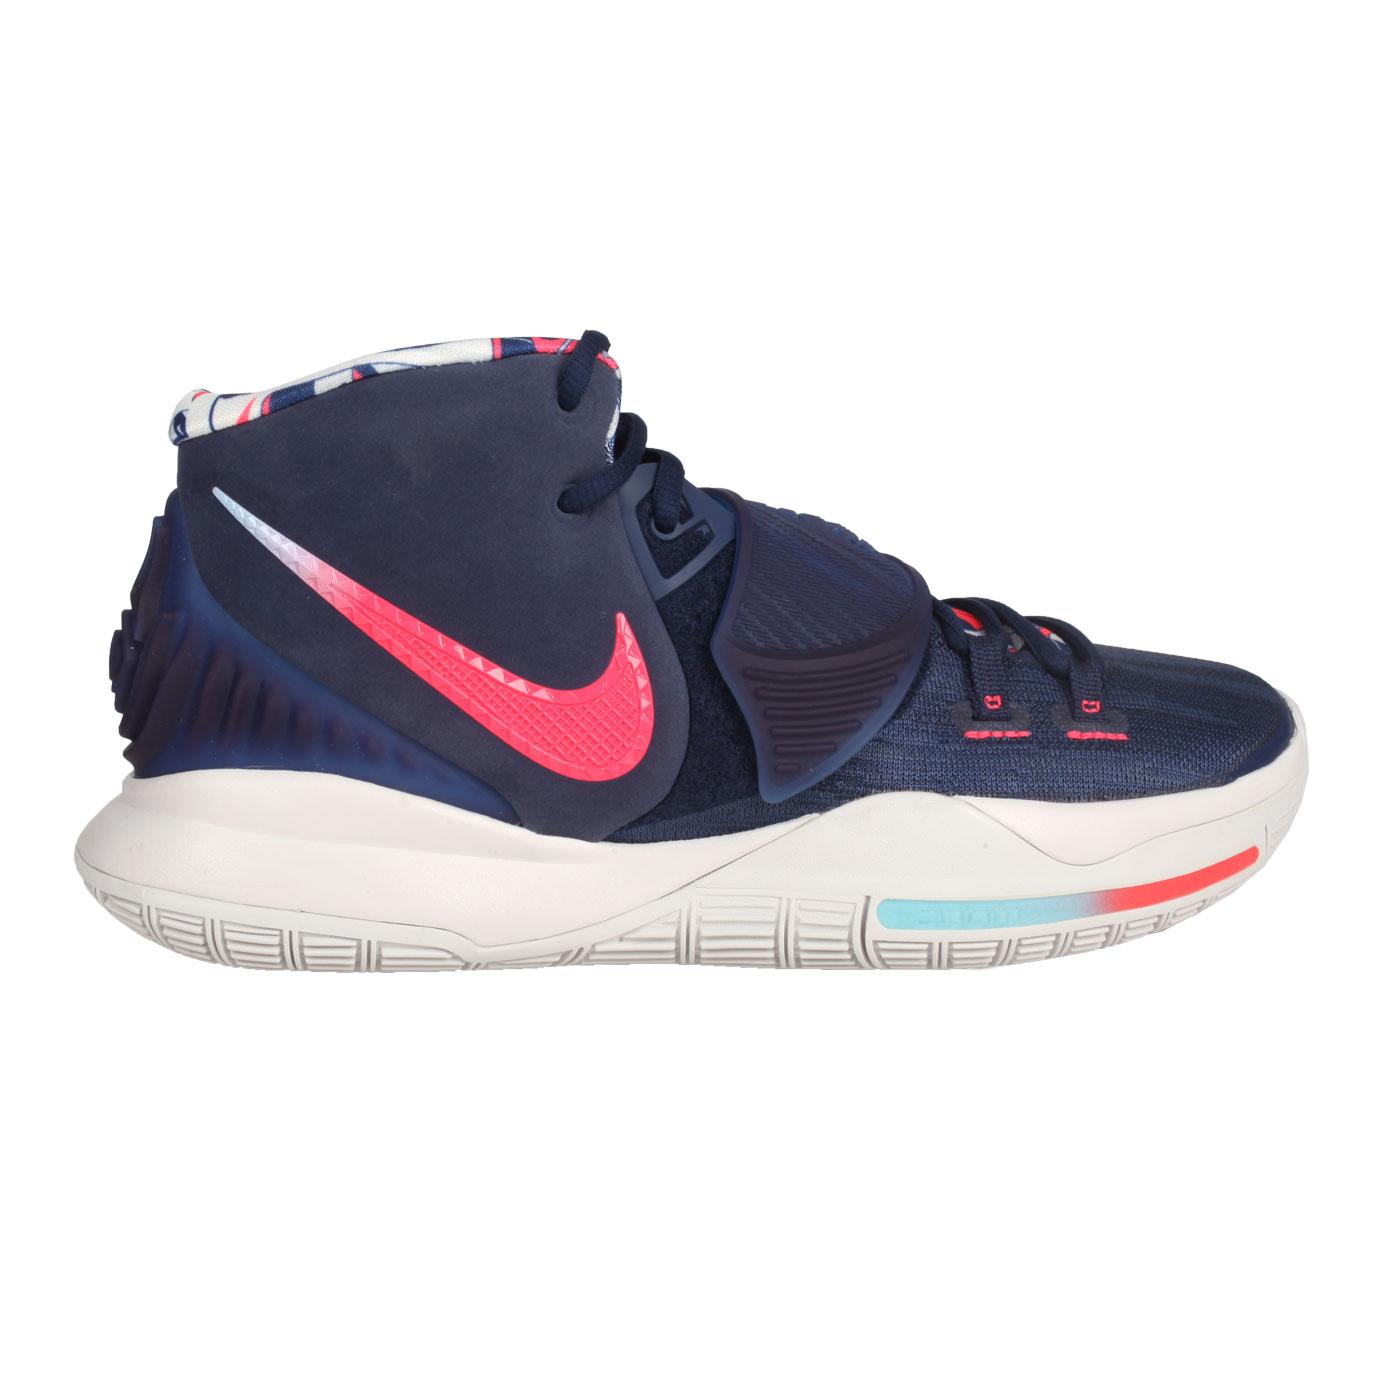 NIKE 男款籃球鞋  @KYRIE 6 EP@BQ4631002 - 丈青亮粉